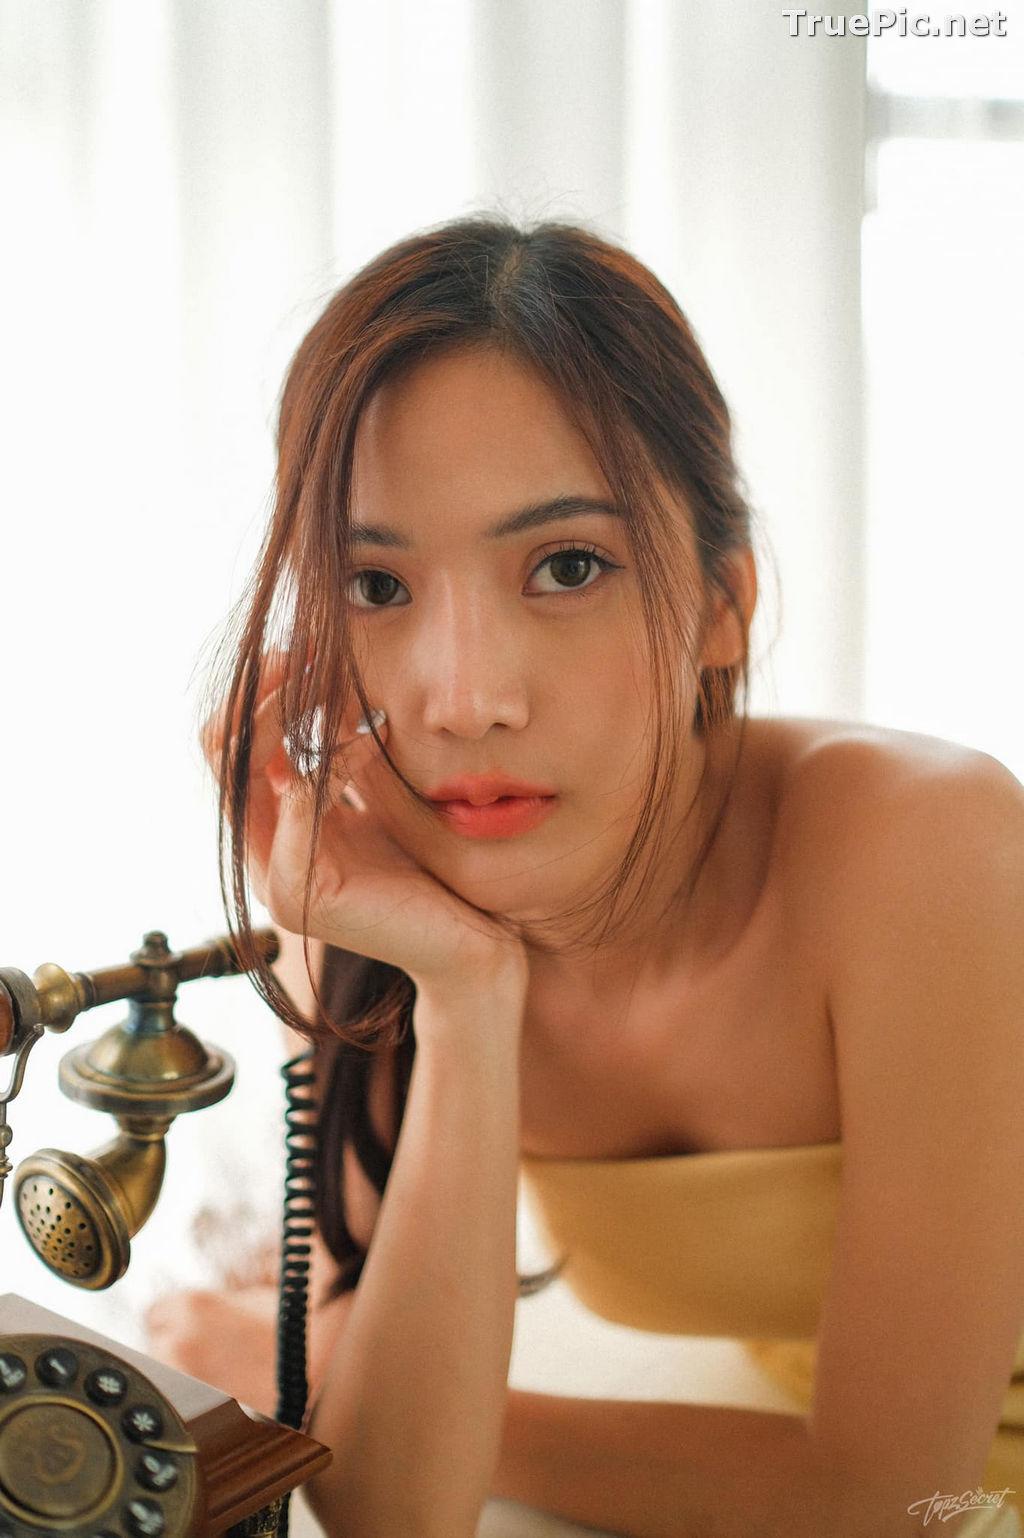 Image Thailand Model - Weeraya Sukaram - Concept Bodycon Dresses - TruePic.net - Picture-5